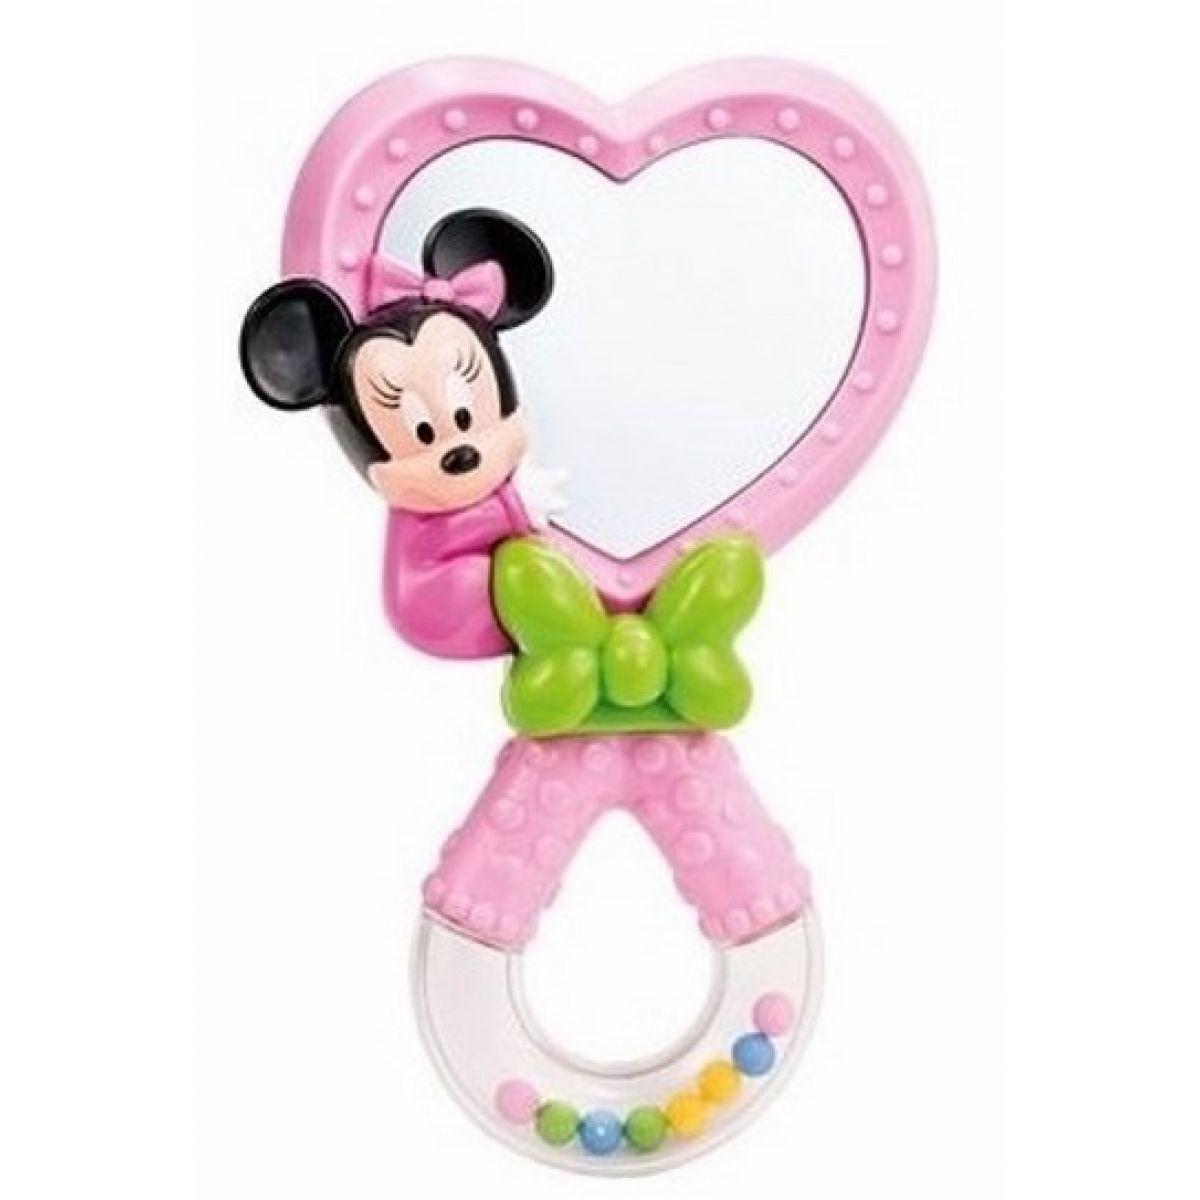 Clementoni Disney Chrastítko se zrcátkem Minnie